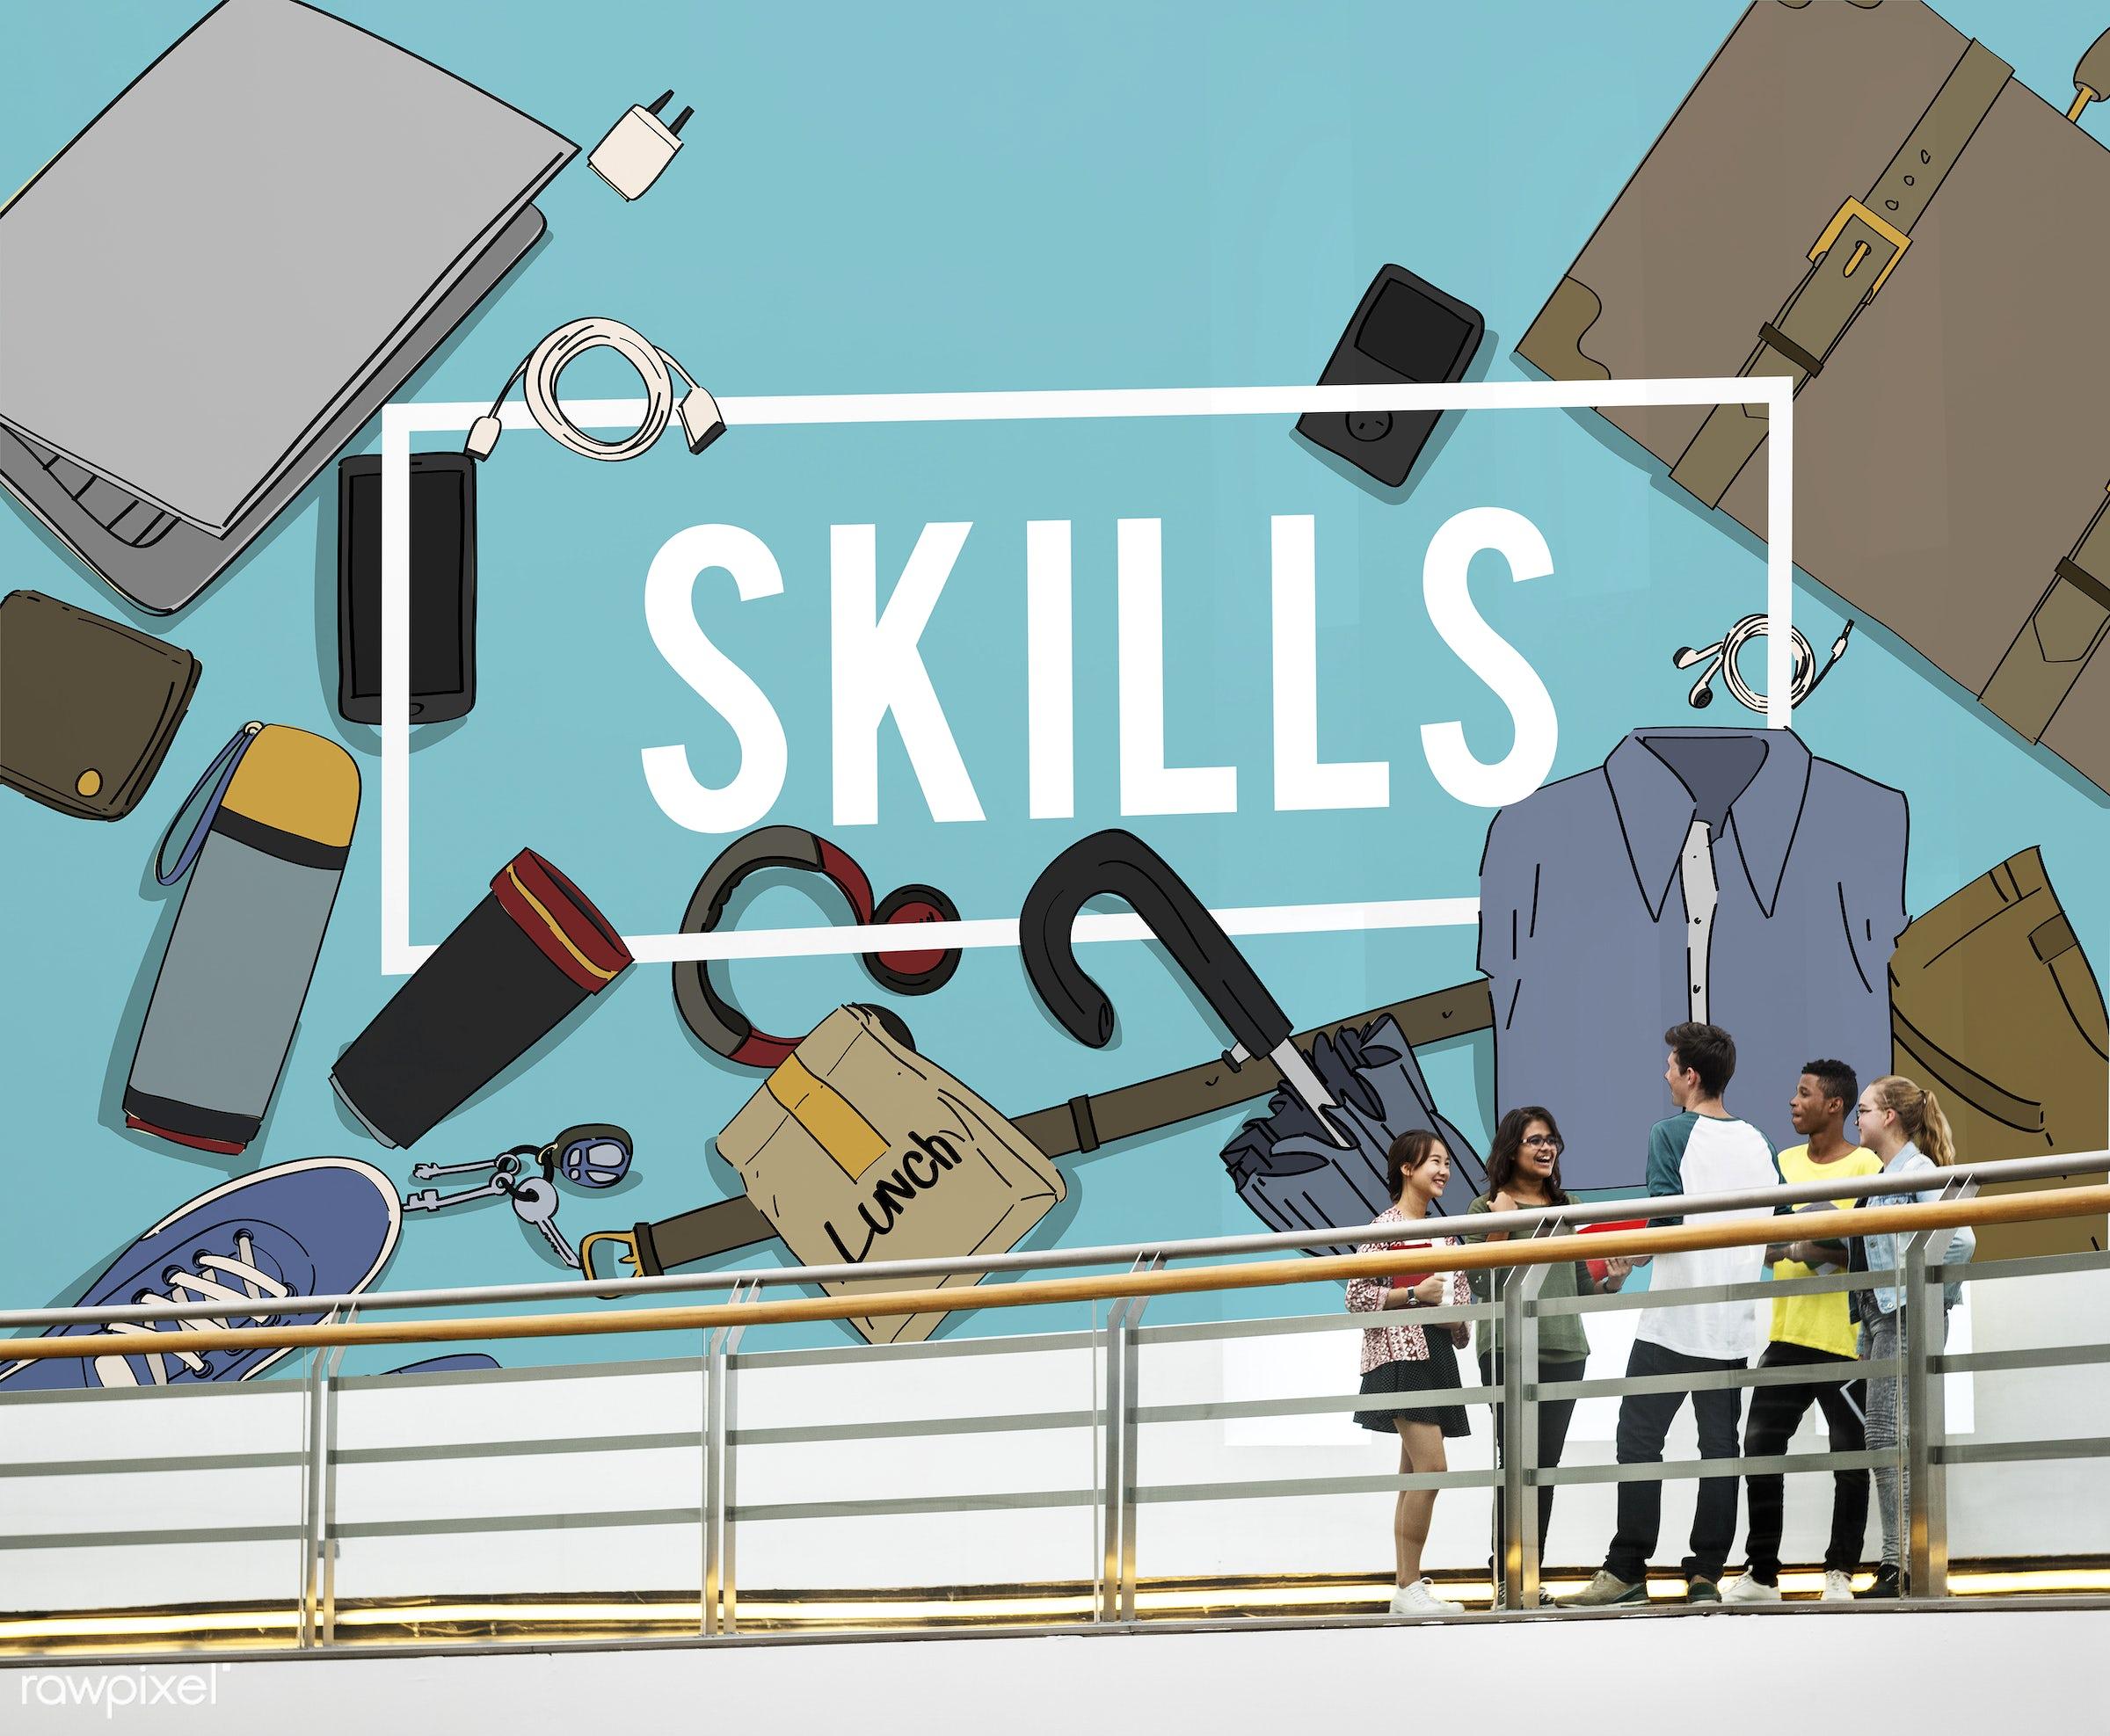 abilities, book, books, boy, bridge, career, carrying, courses, development, education, employees, friends, friendship,...